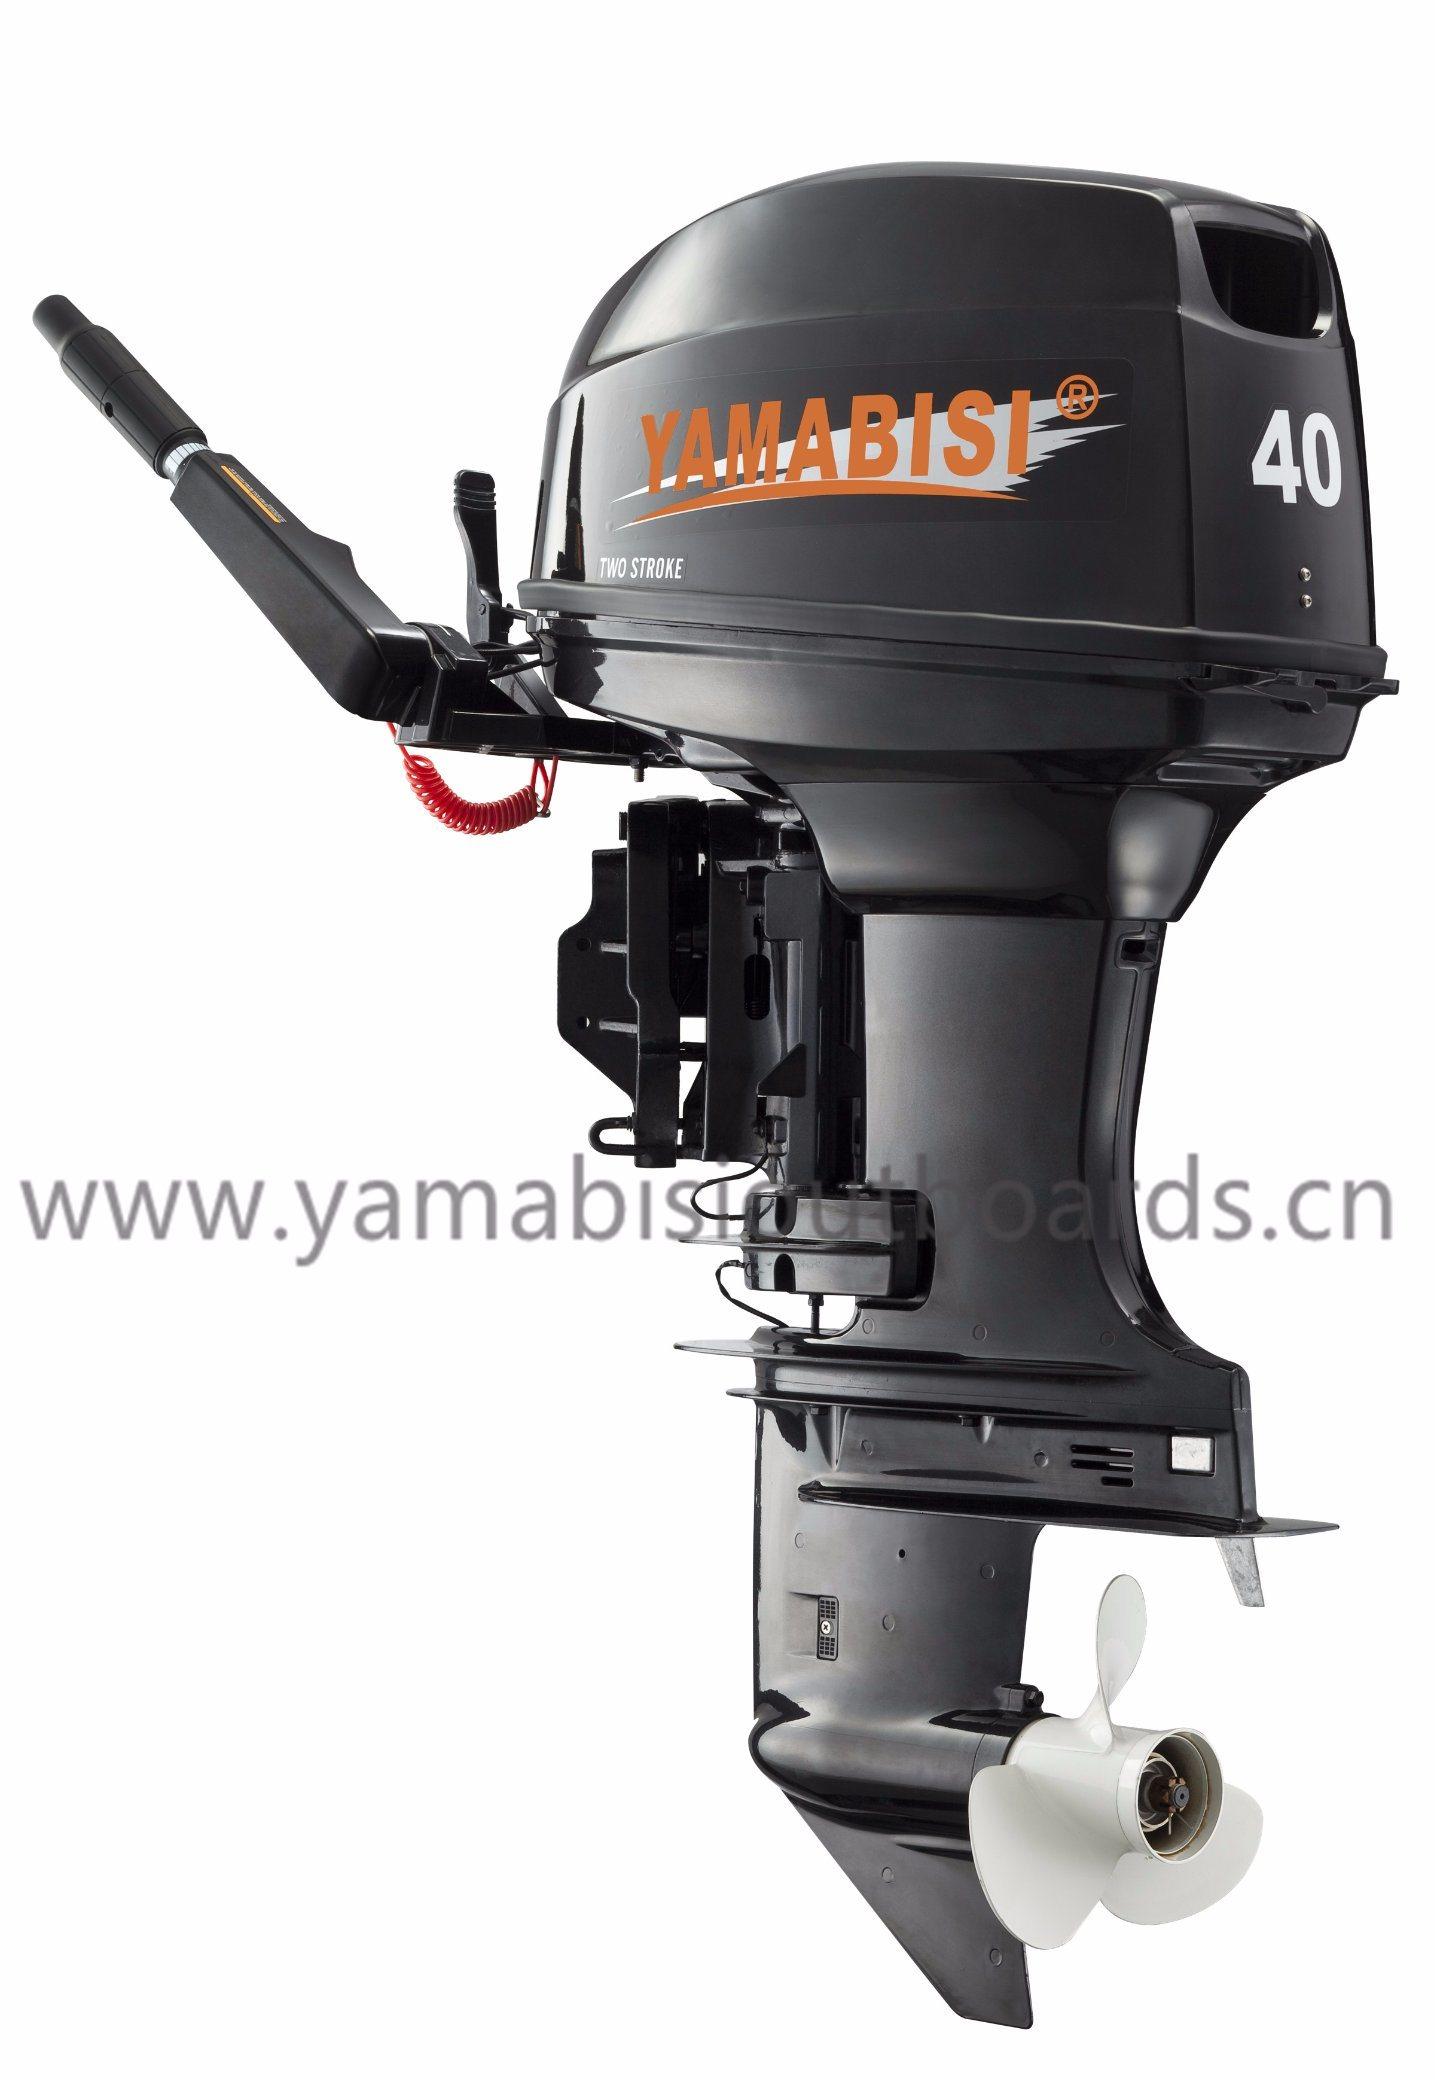 2 Stroke 15HP Yamabisi Outboard Motor